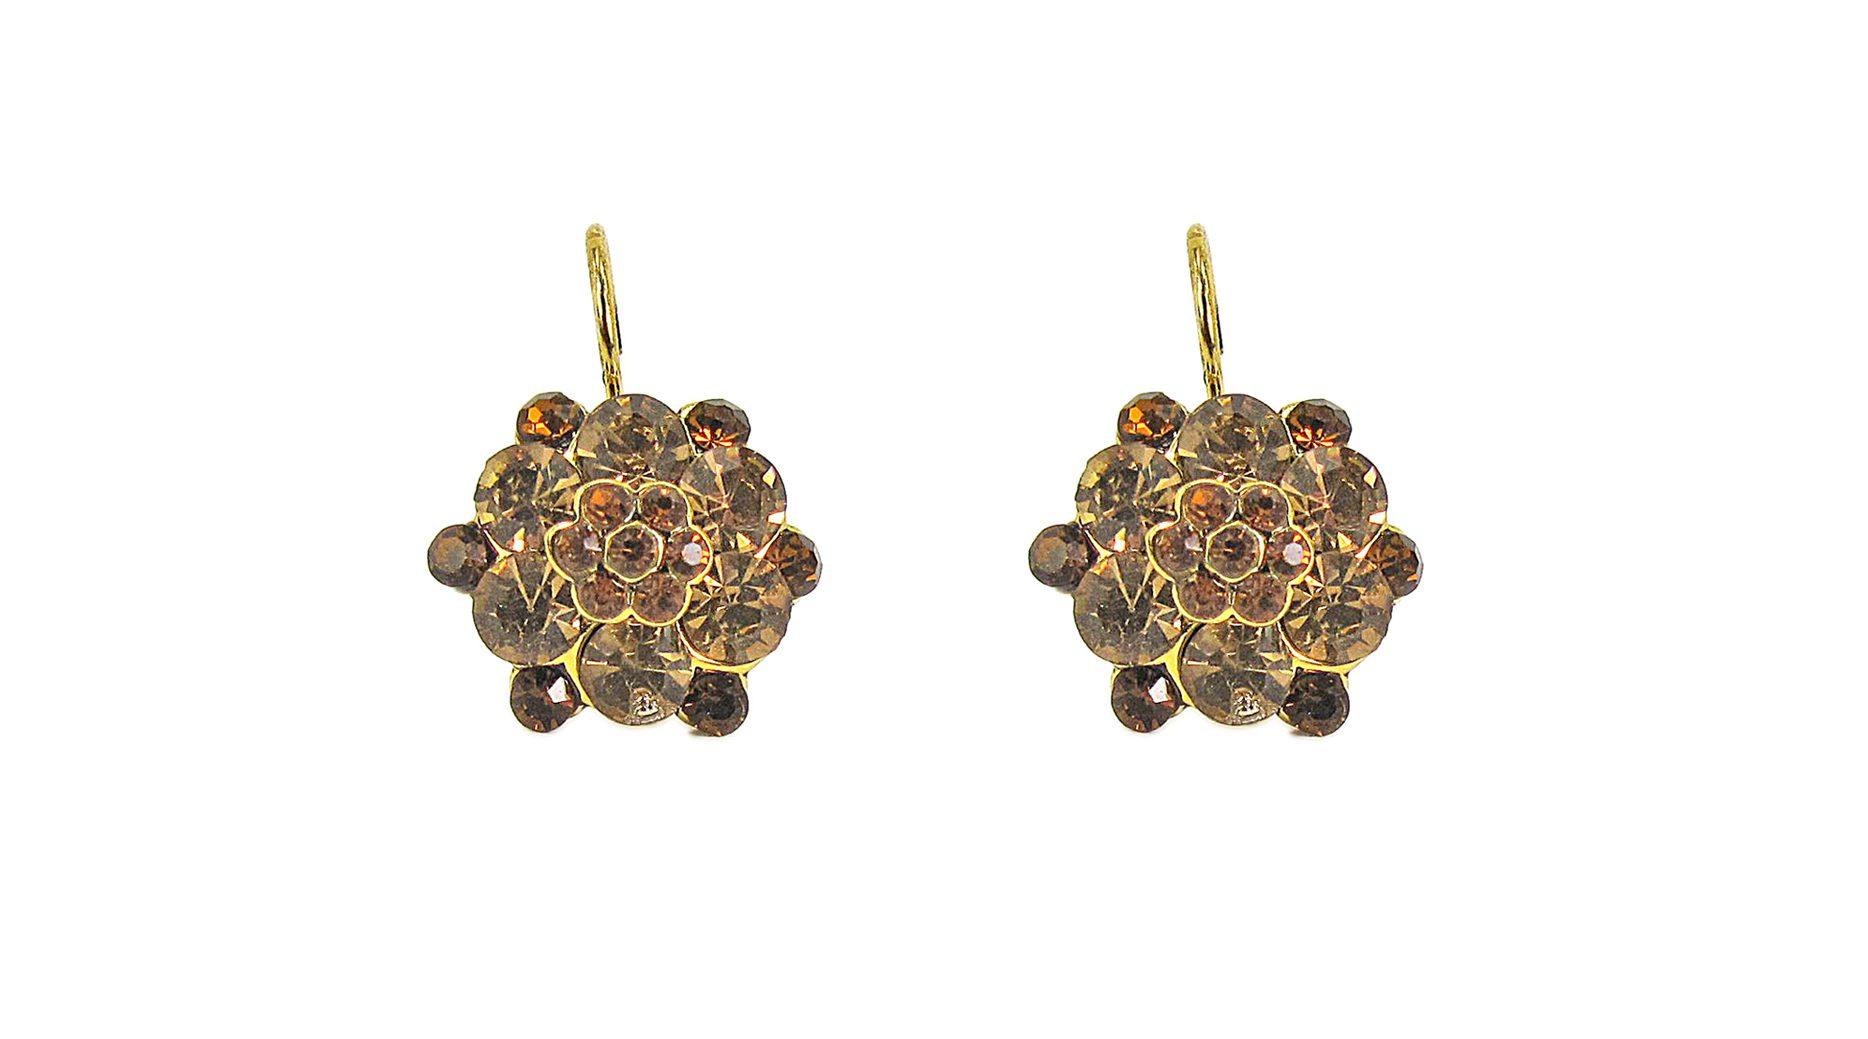 earrings with brown gems arranged like flowers